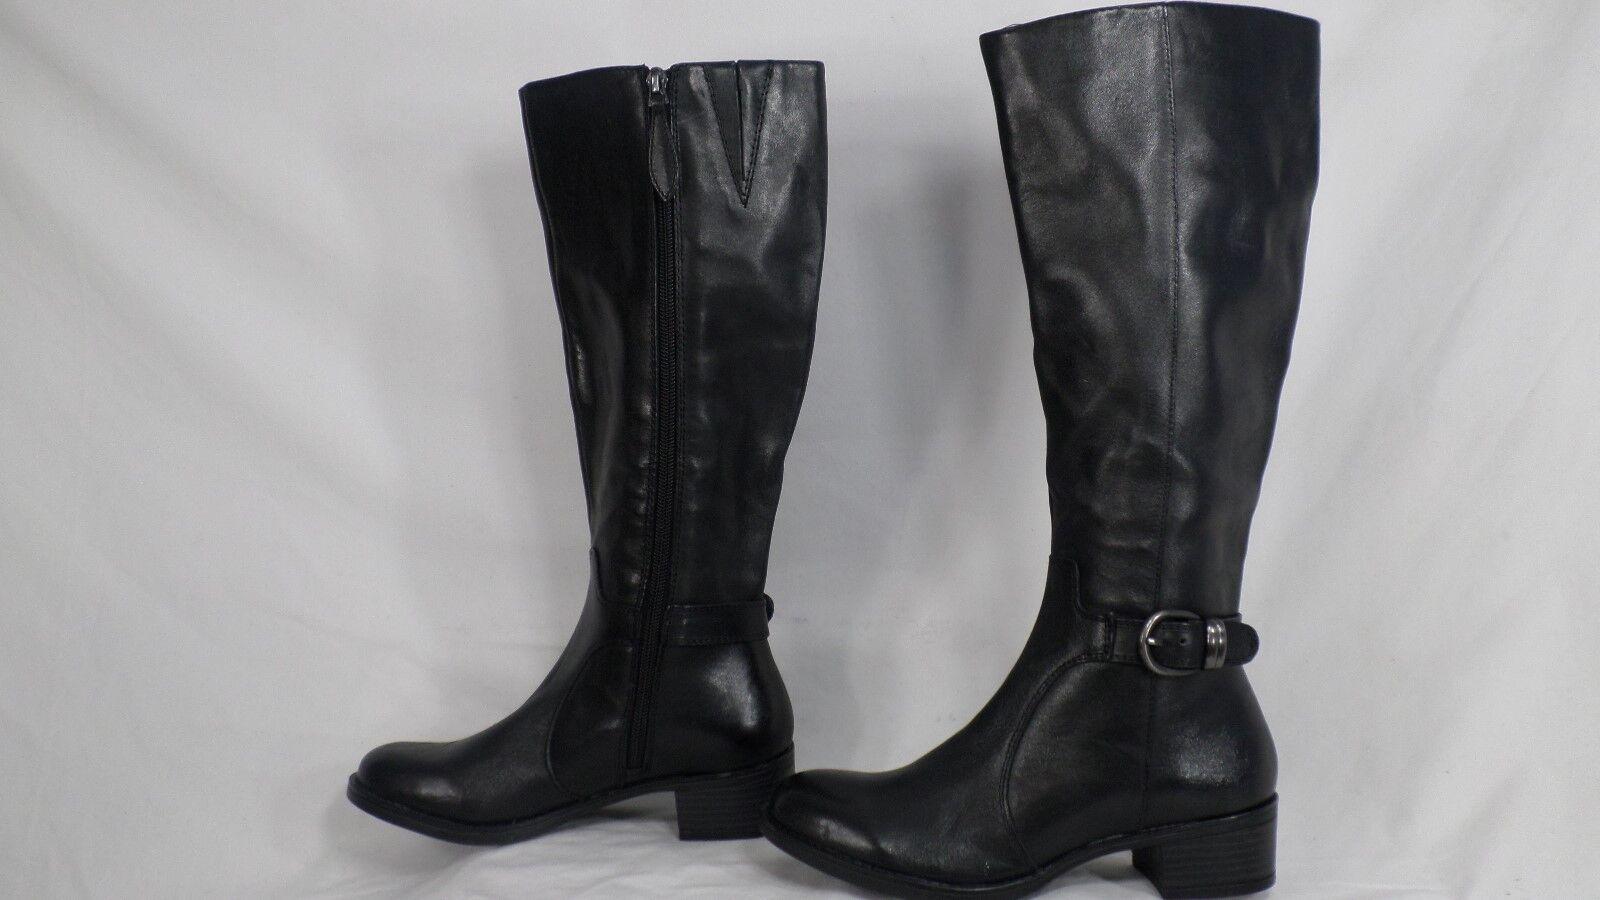 Franco Sarto 'Cecily' Smooth Back Leder Equestrian Style Boot Damens Größe 5 M